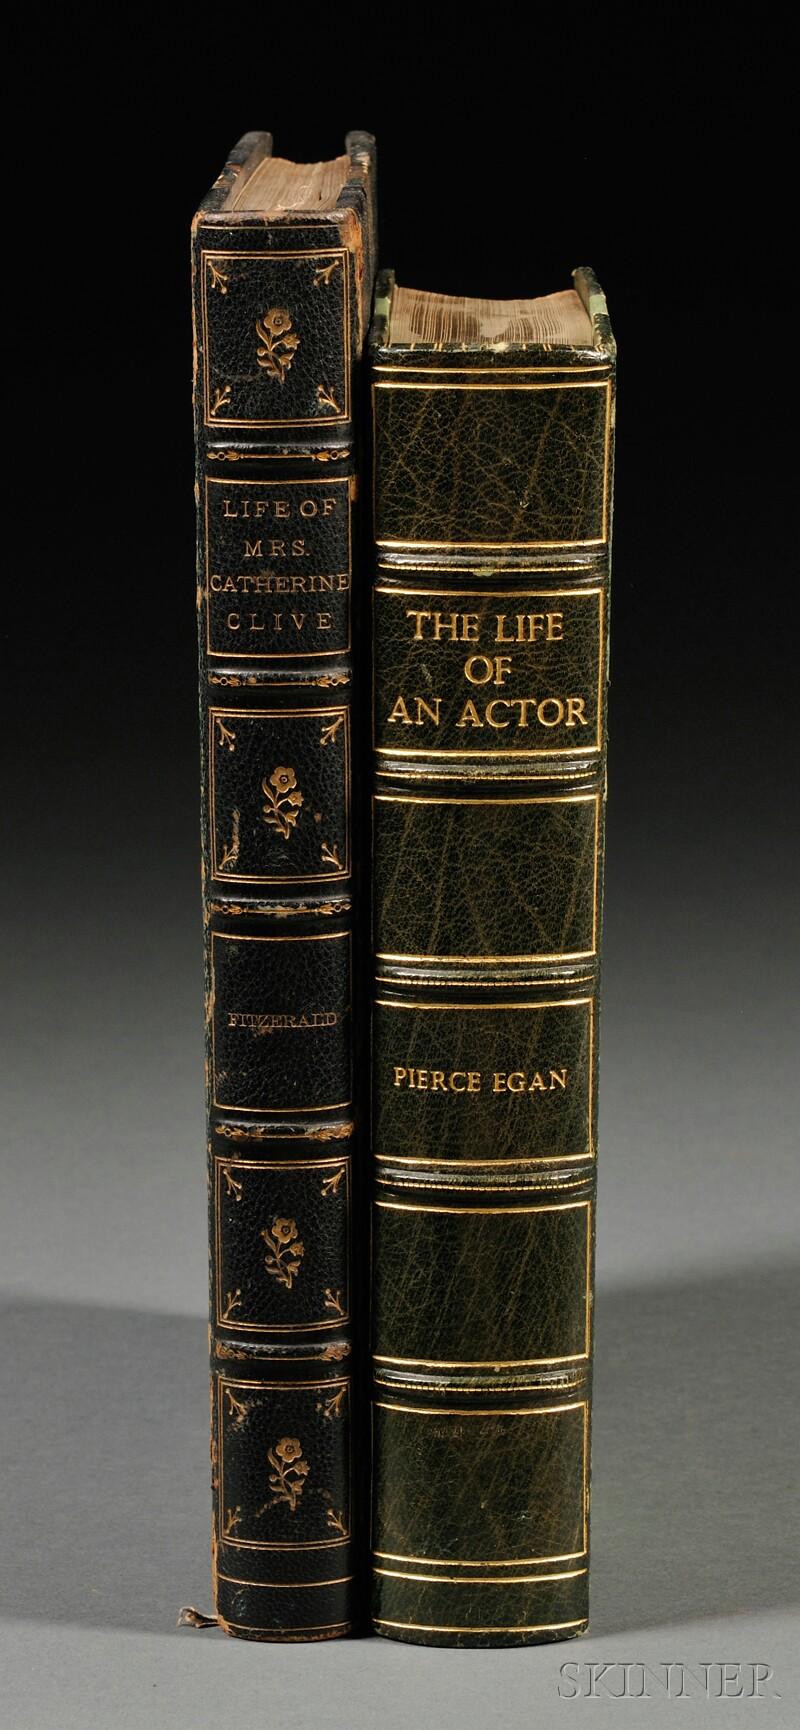 Egan, Pierce (1772-1849) The Life of an Actor